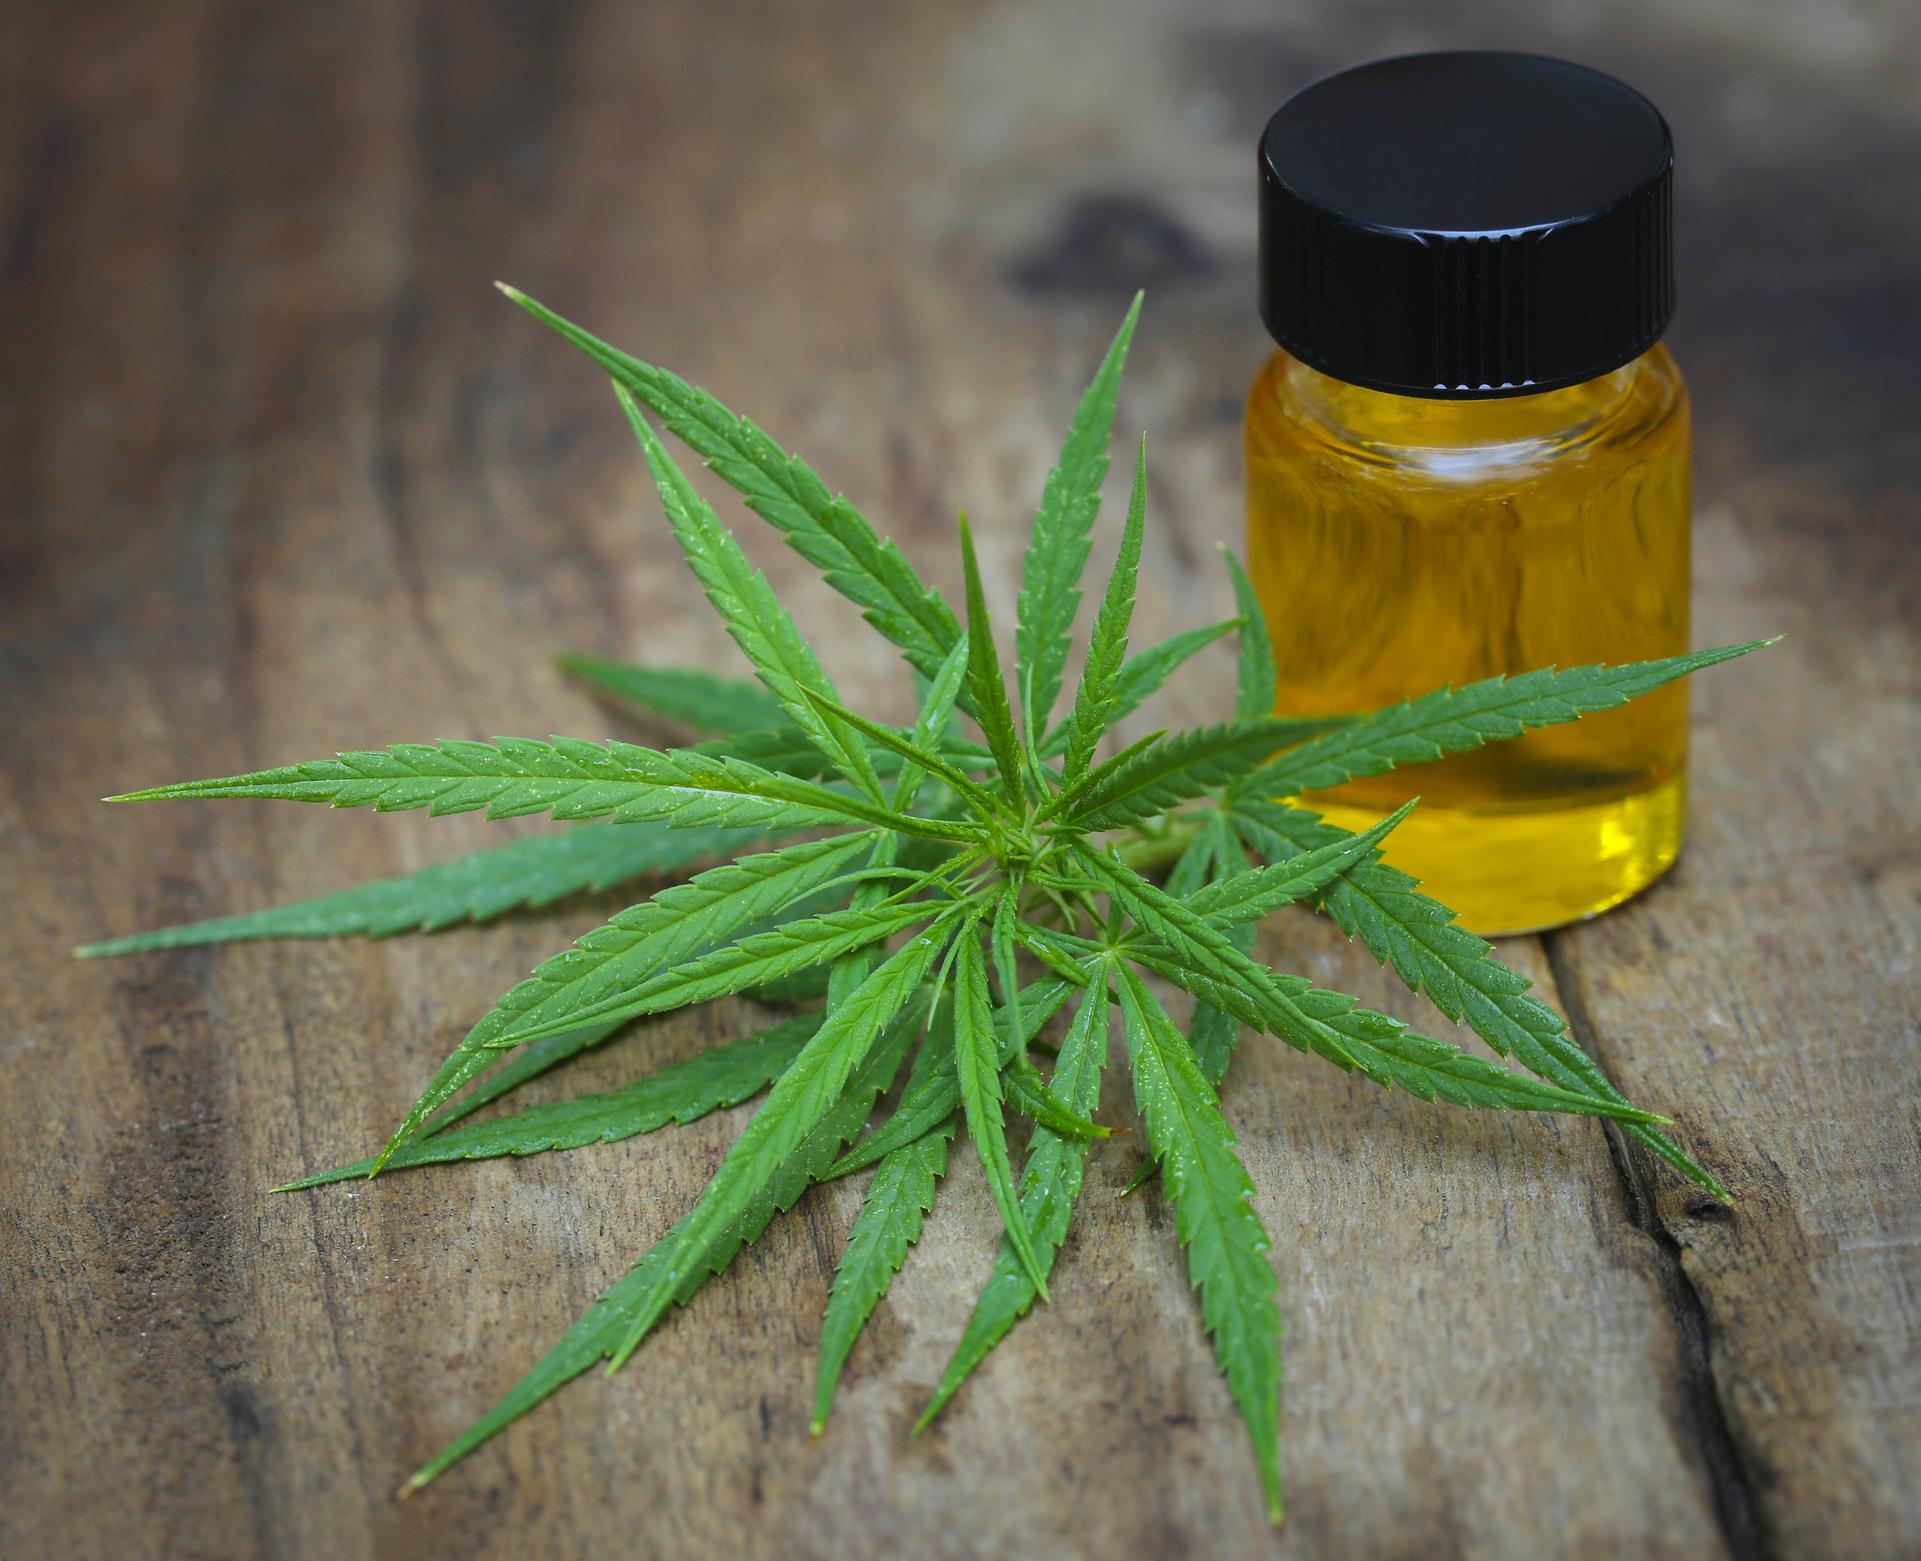 A vial of cannabidiol oil next to cannabis leaves on a table.